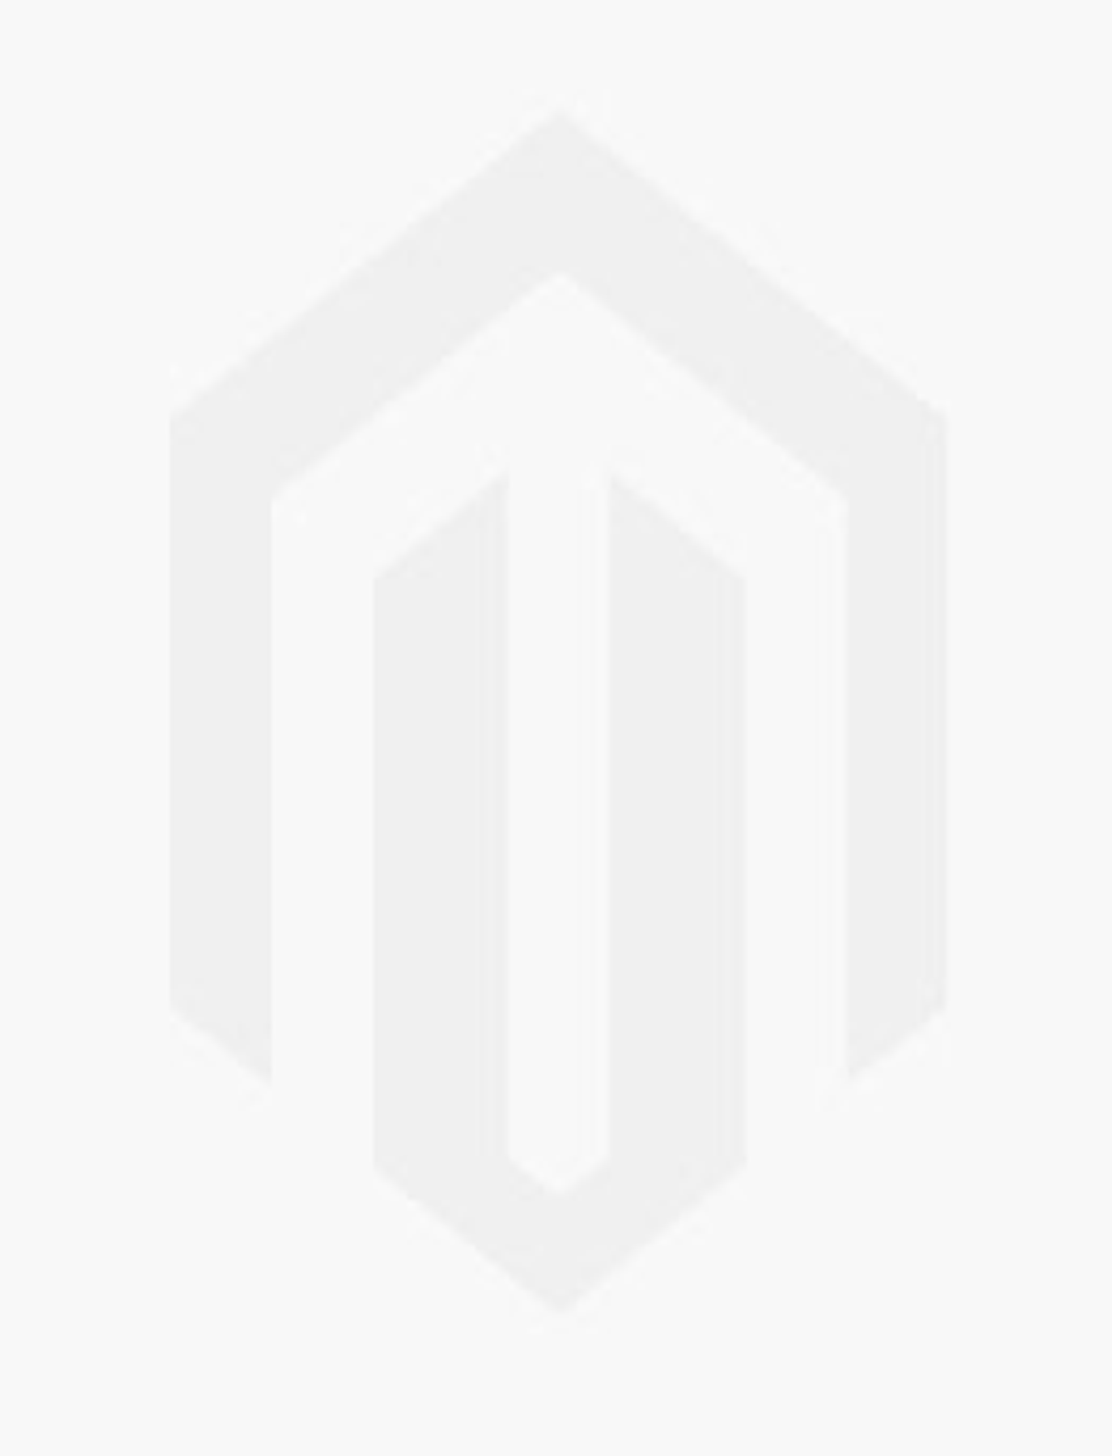 Med. Matte Skull with Black Diamond Eyes Frontal Image #1